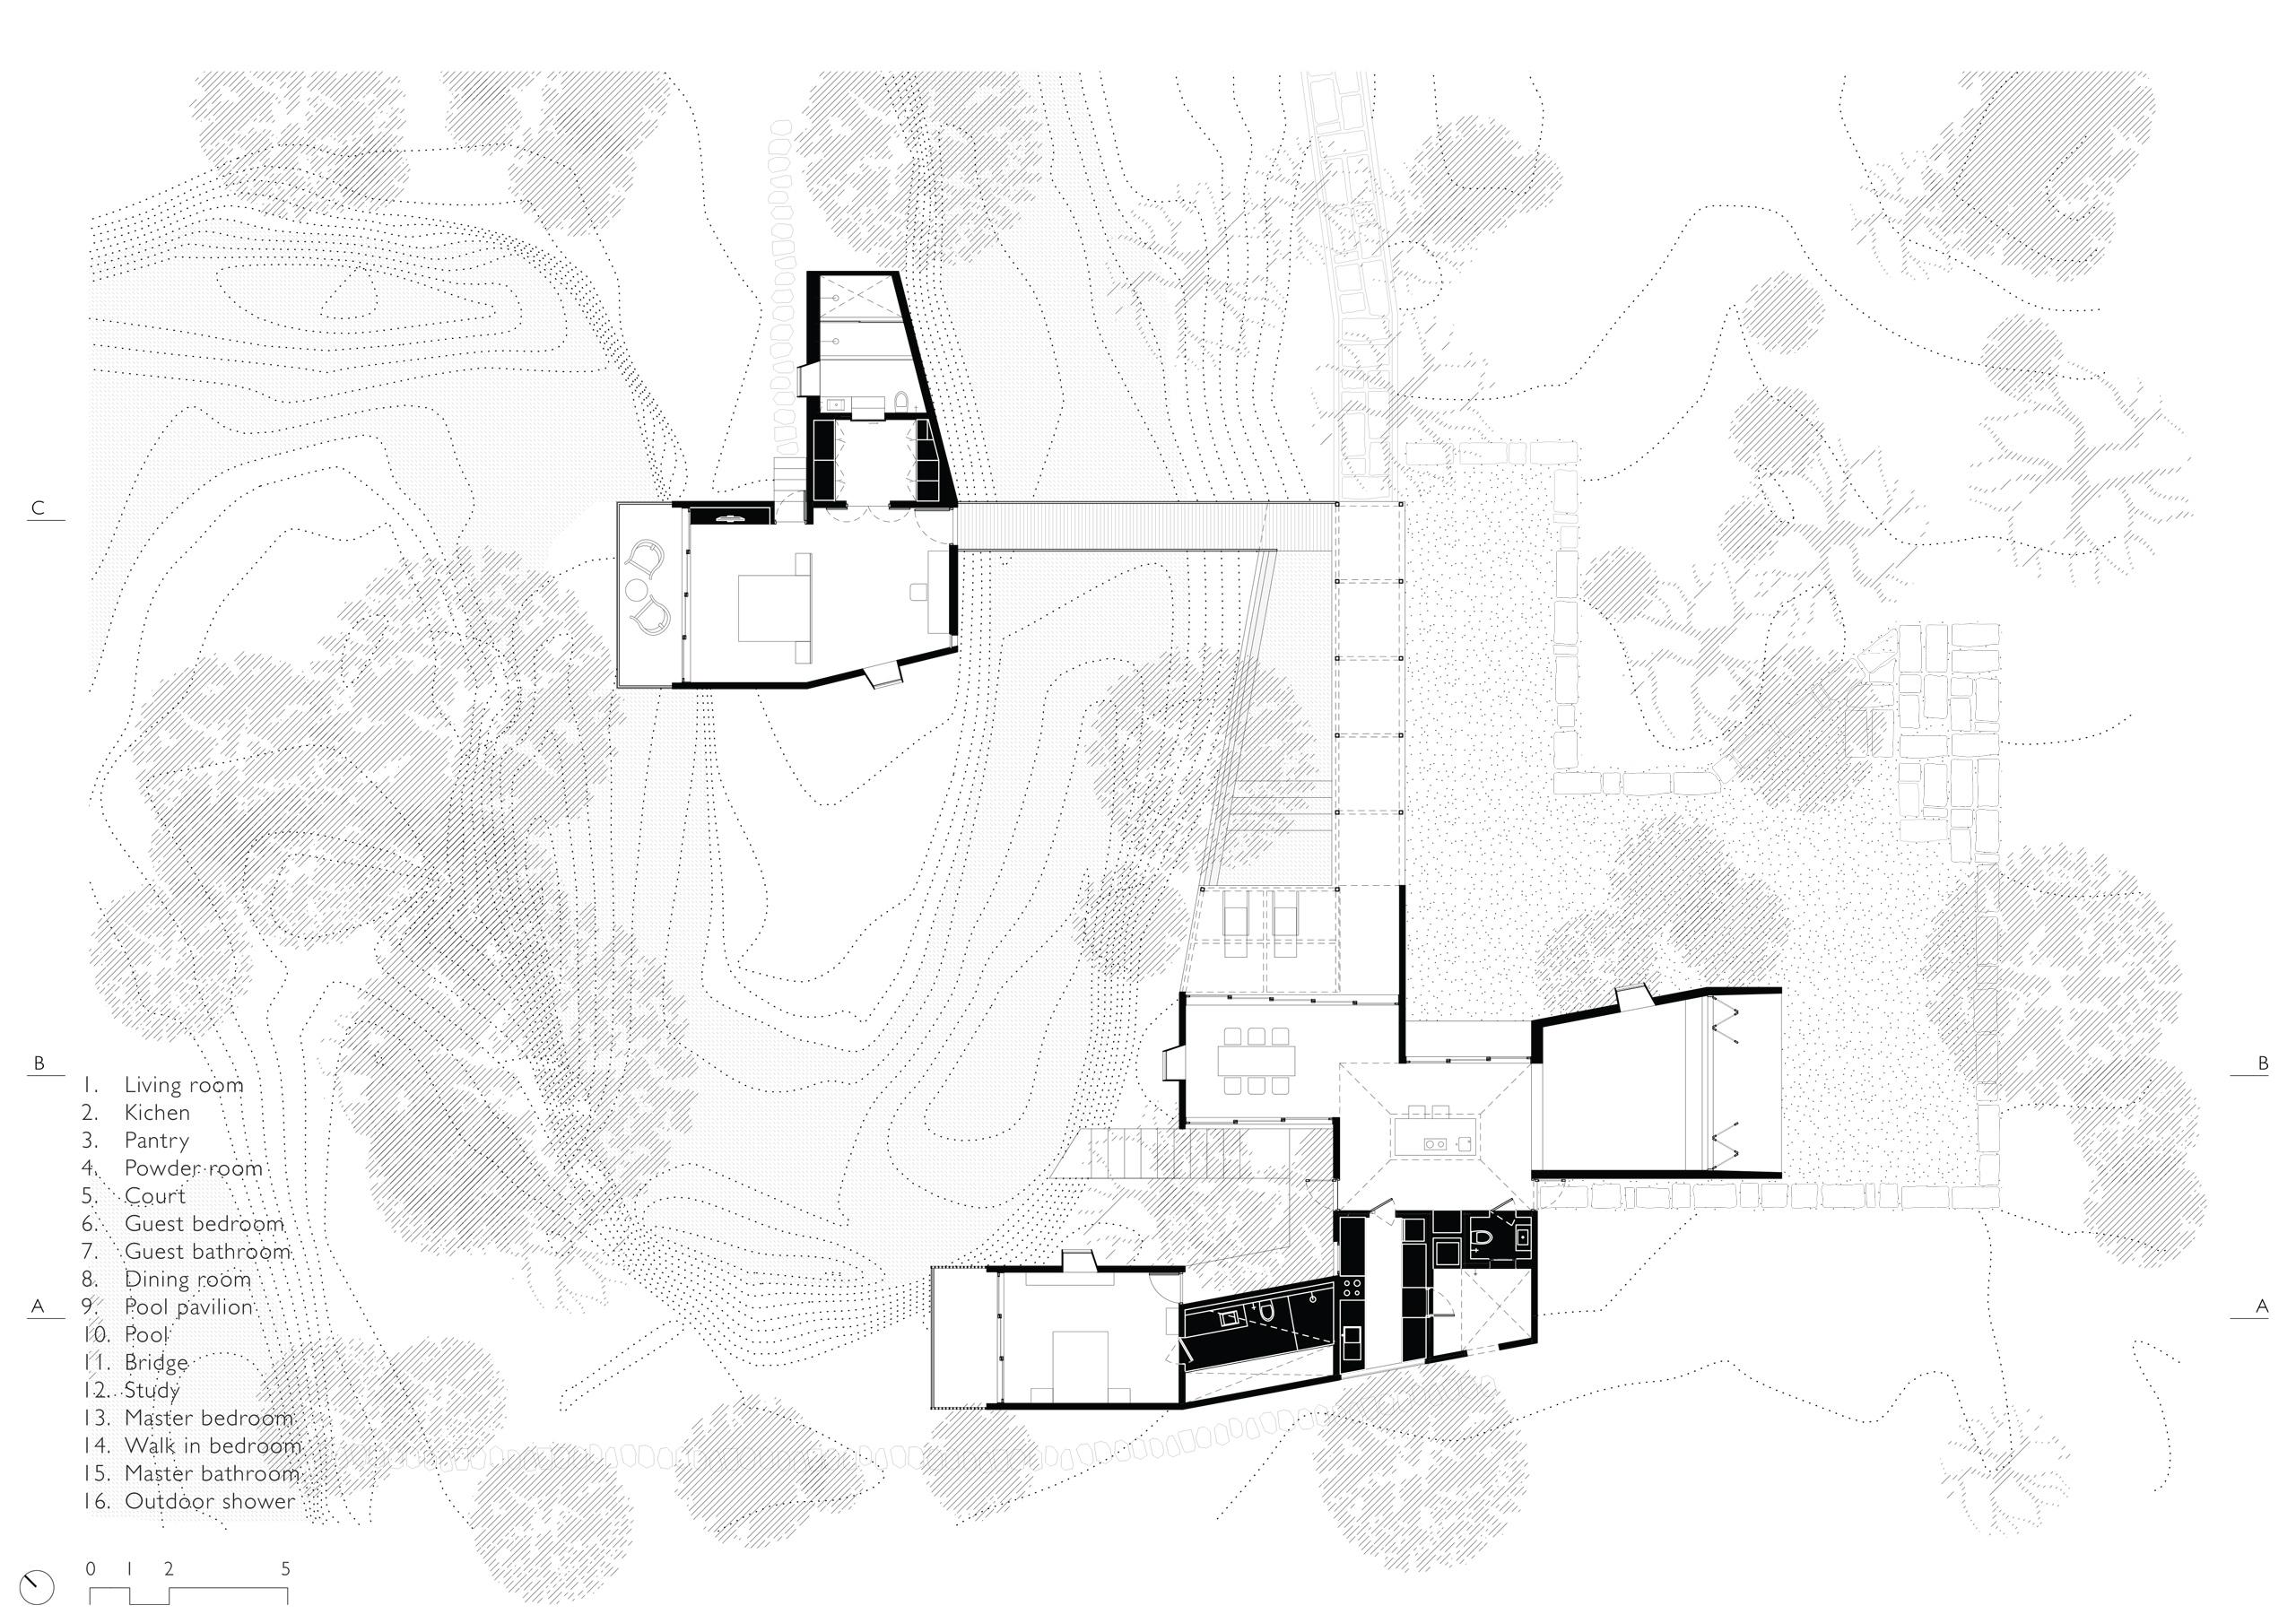 Floor plan of House on a STream in Alibag